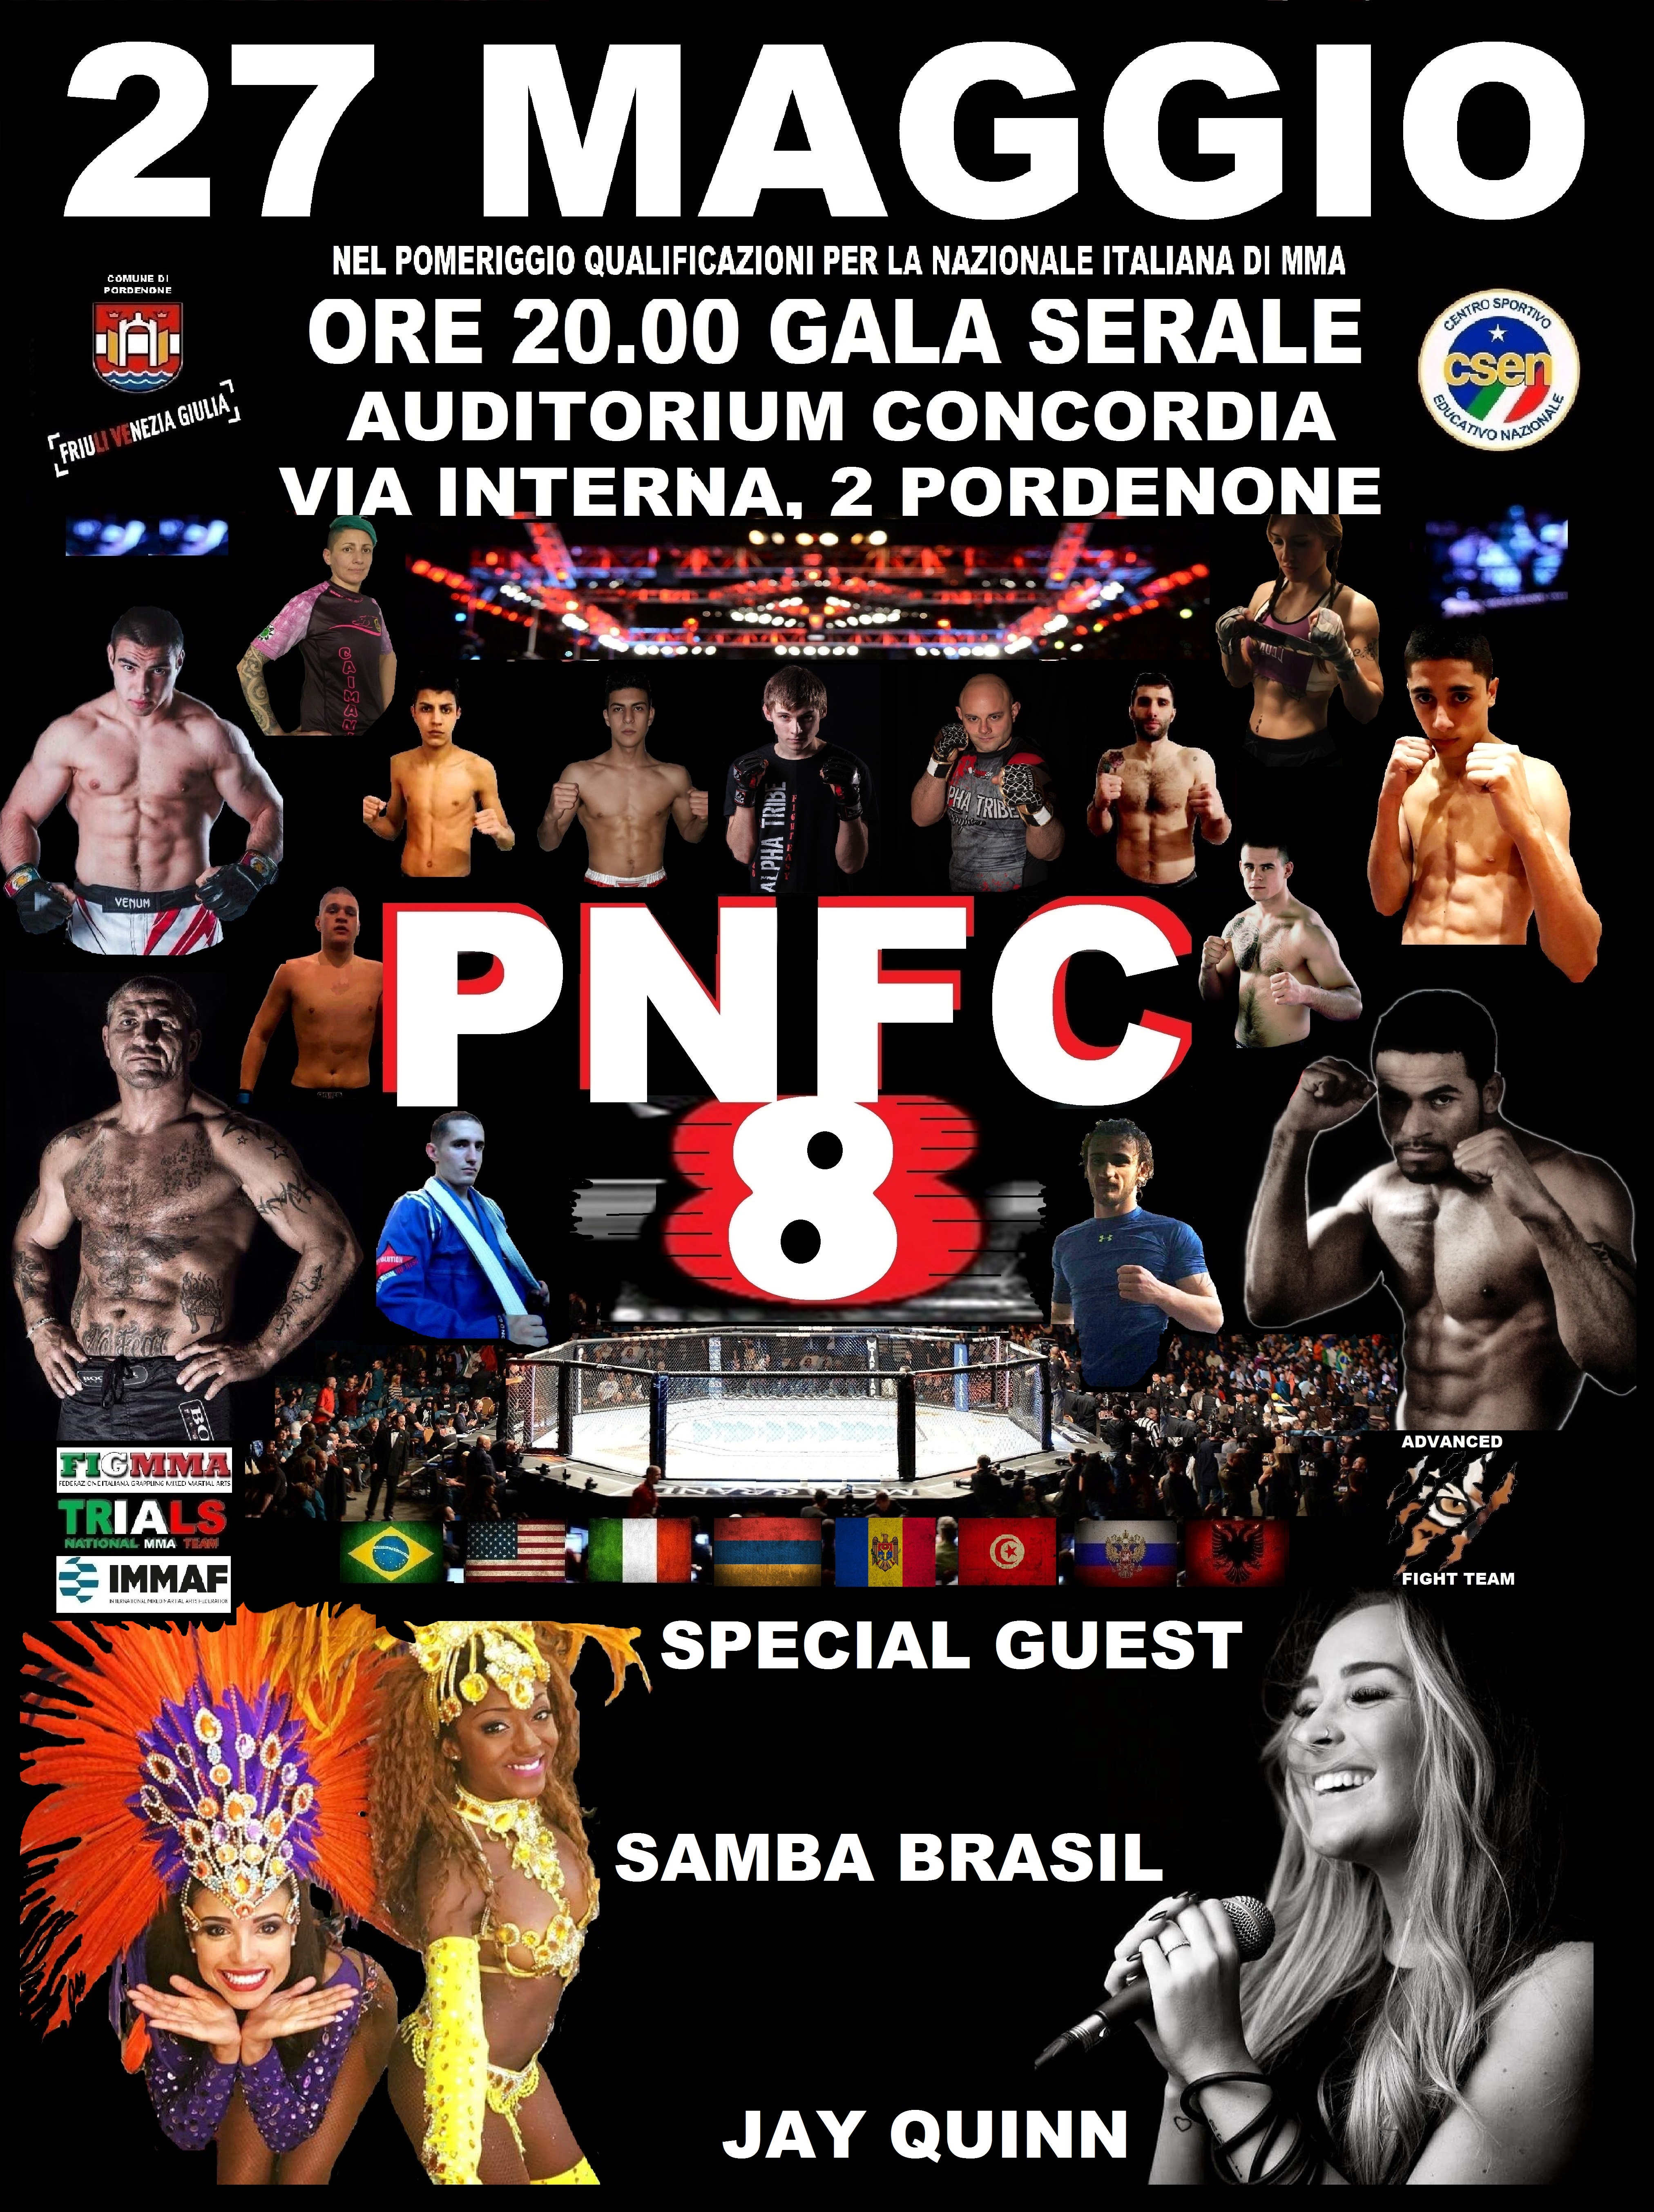 PNFC8: un grande MAIN EVENT per una grande serata 2